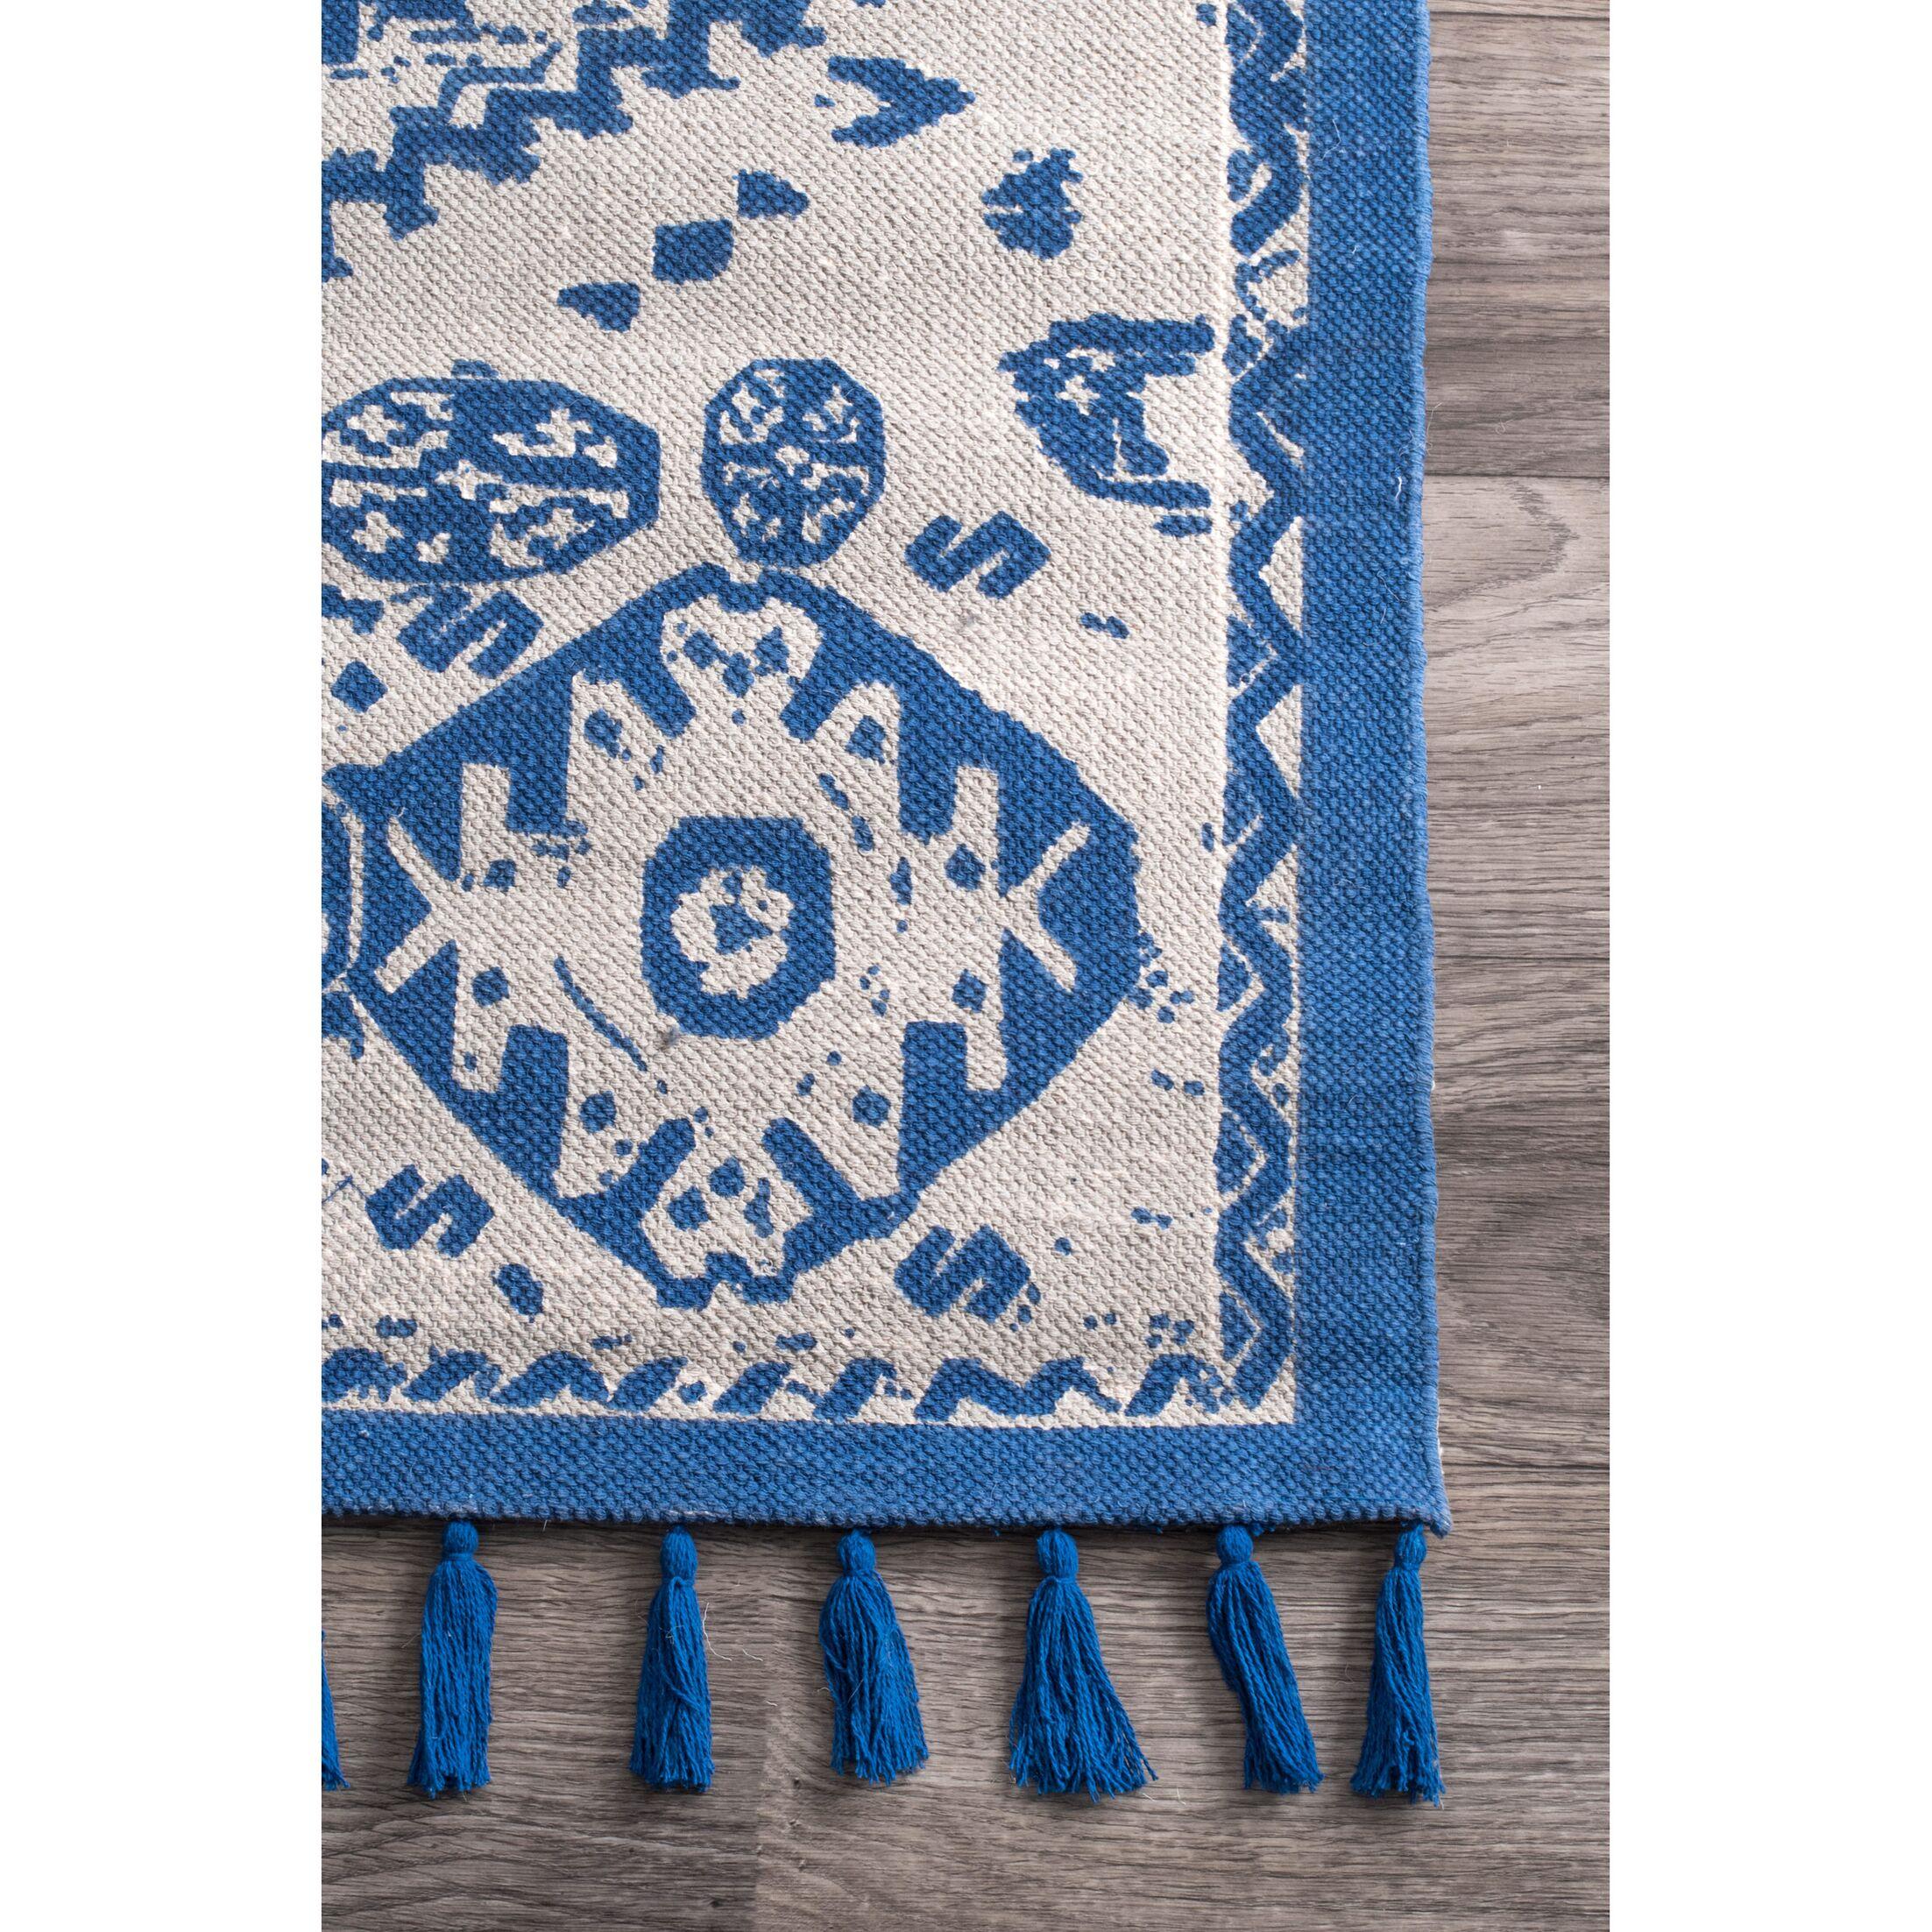 Quartier Hand-Woven Blue Area Rug Rug Size: Rectangle 8' x 10'